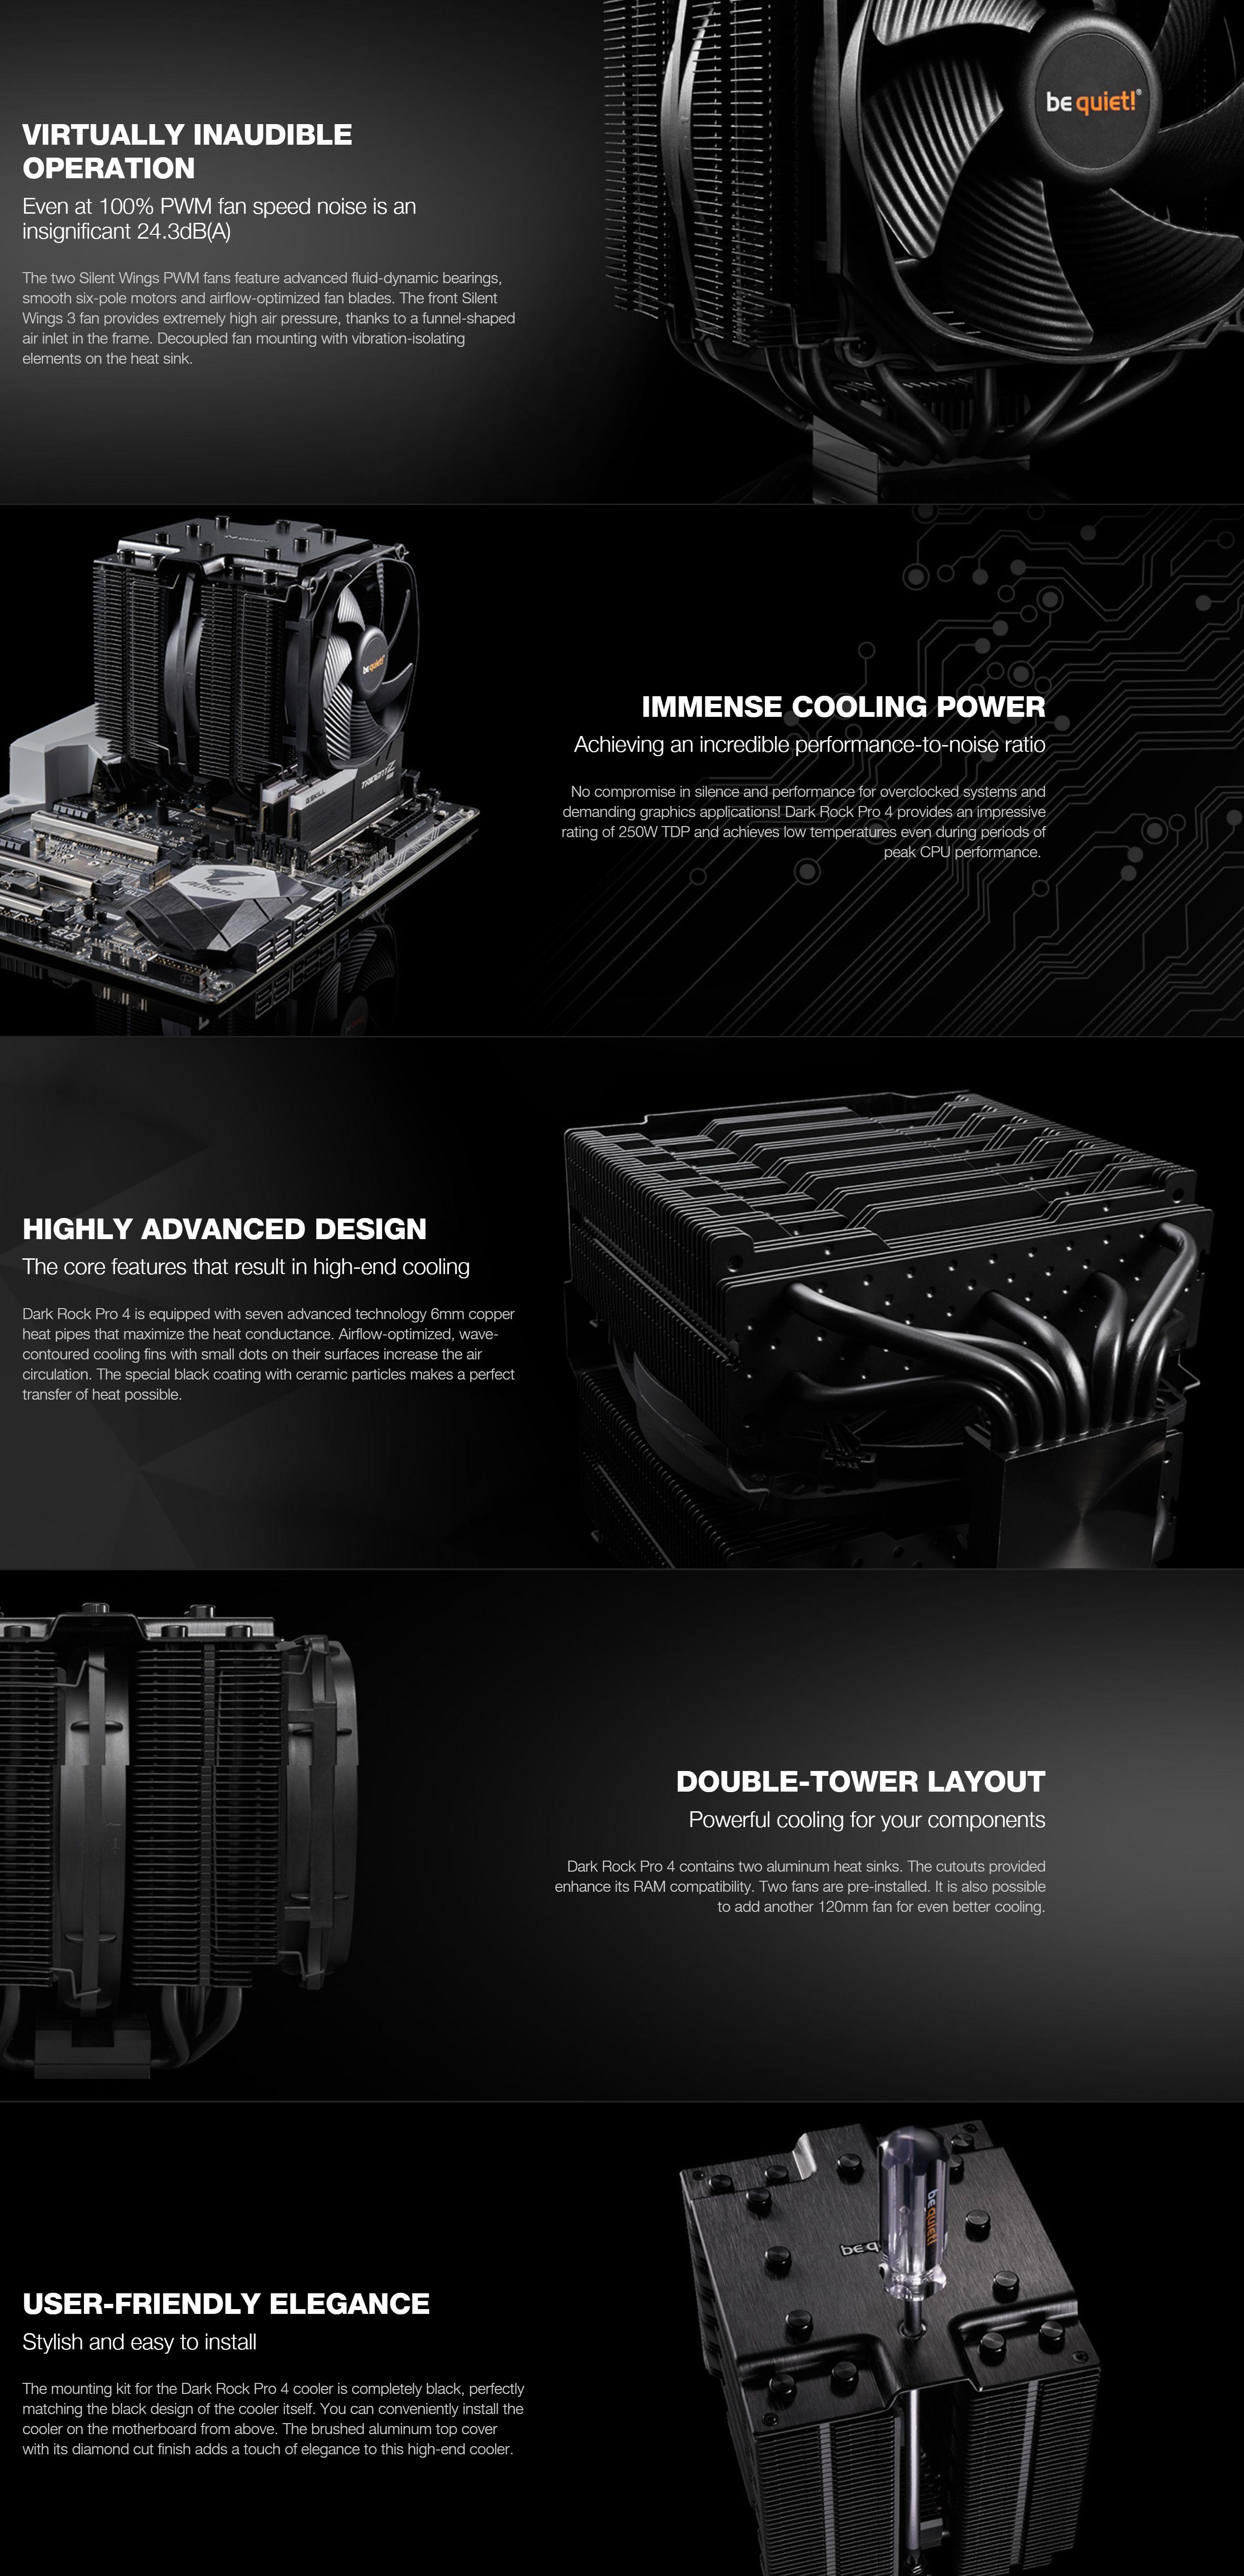 #1707 - 'DARK ROCK PRO 4 silent high-end Air coolers from be quiet!' - www_bequiet_com.jpg